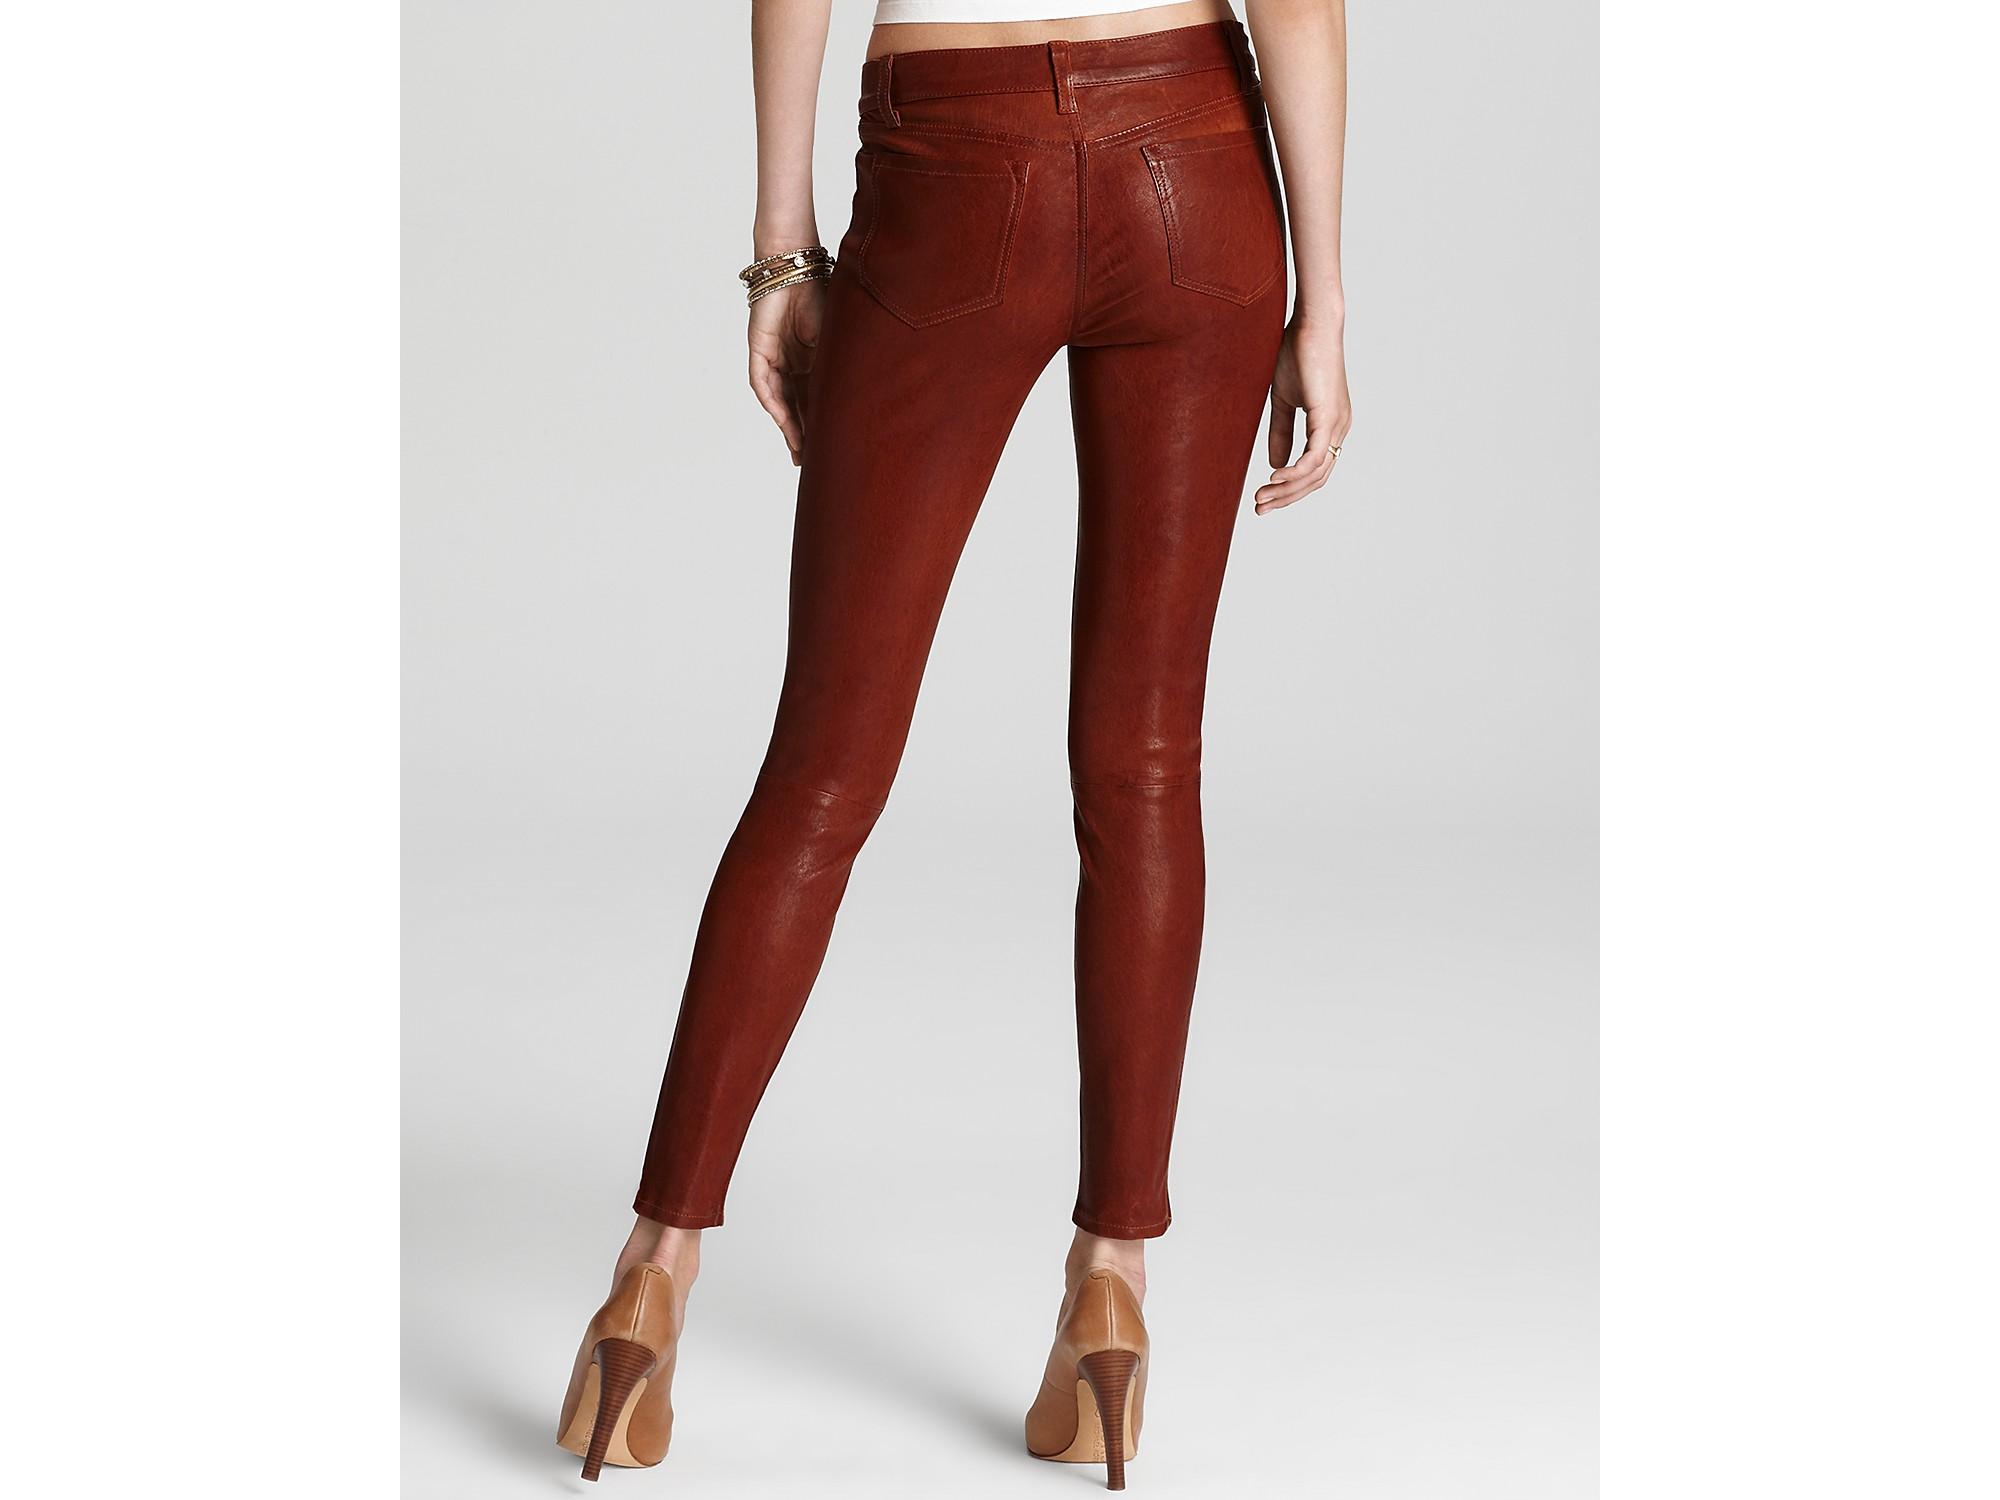 f3efa661ca3fd Lyst - J Brand Pants Super Skinny Leather in Cognac in Brown